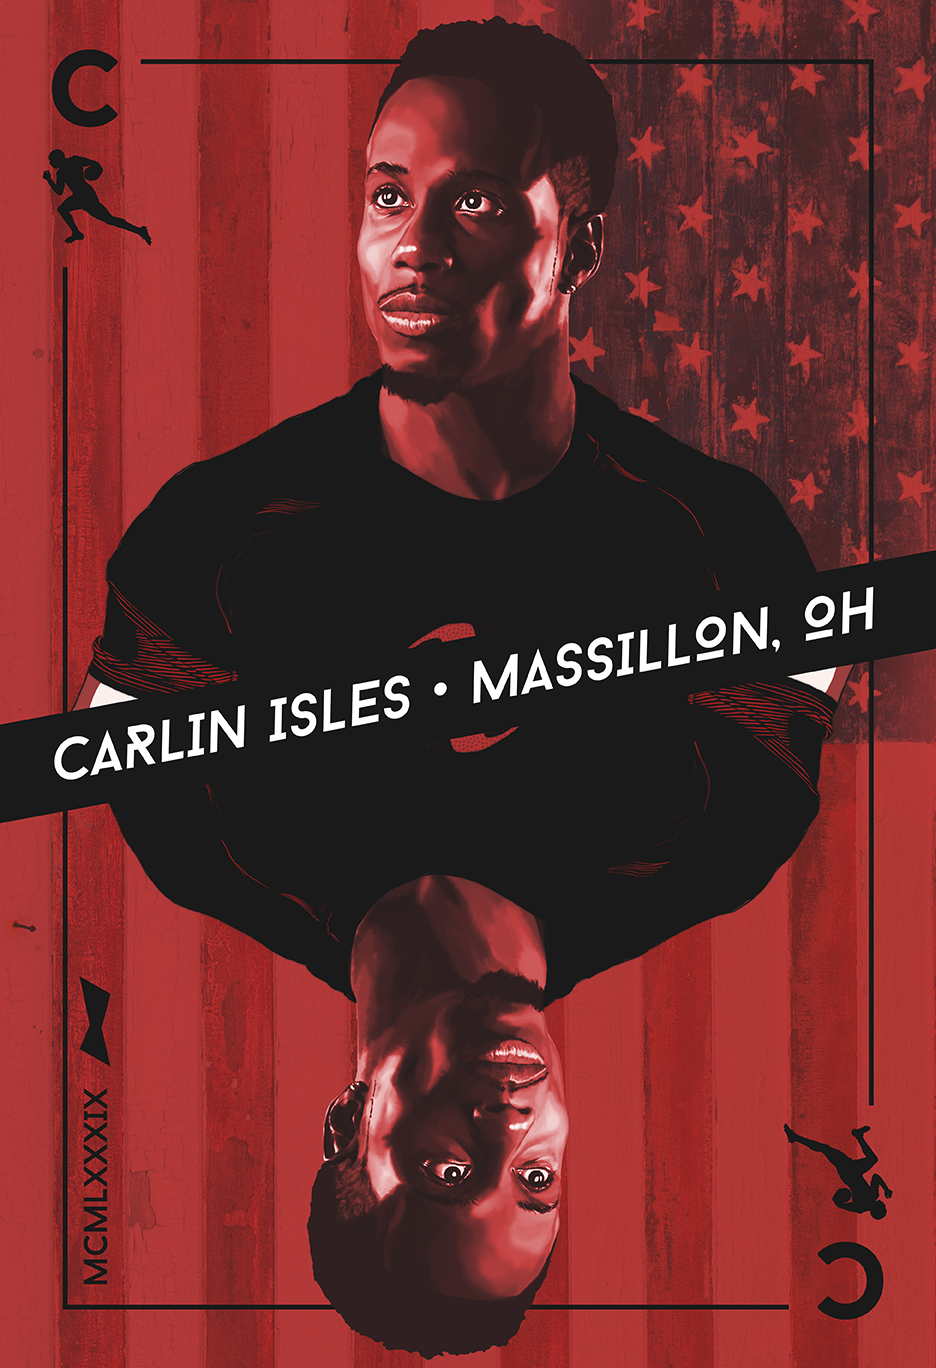 Carlin-Card-Vertical13x19.jpg